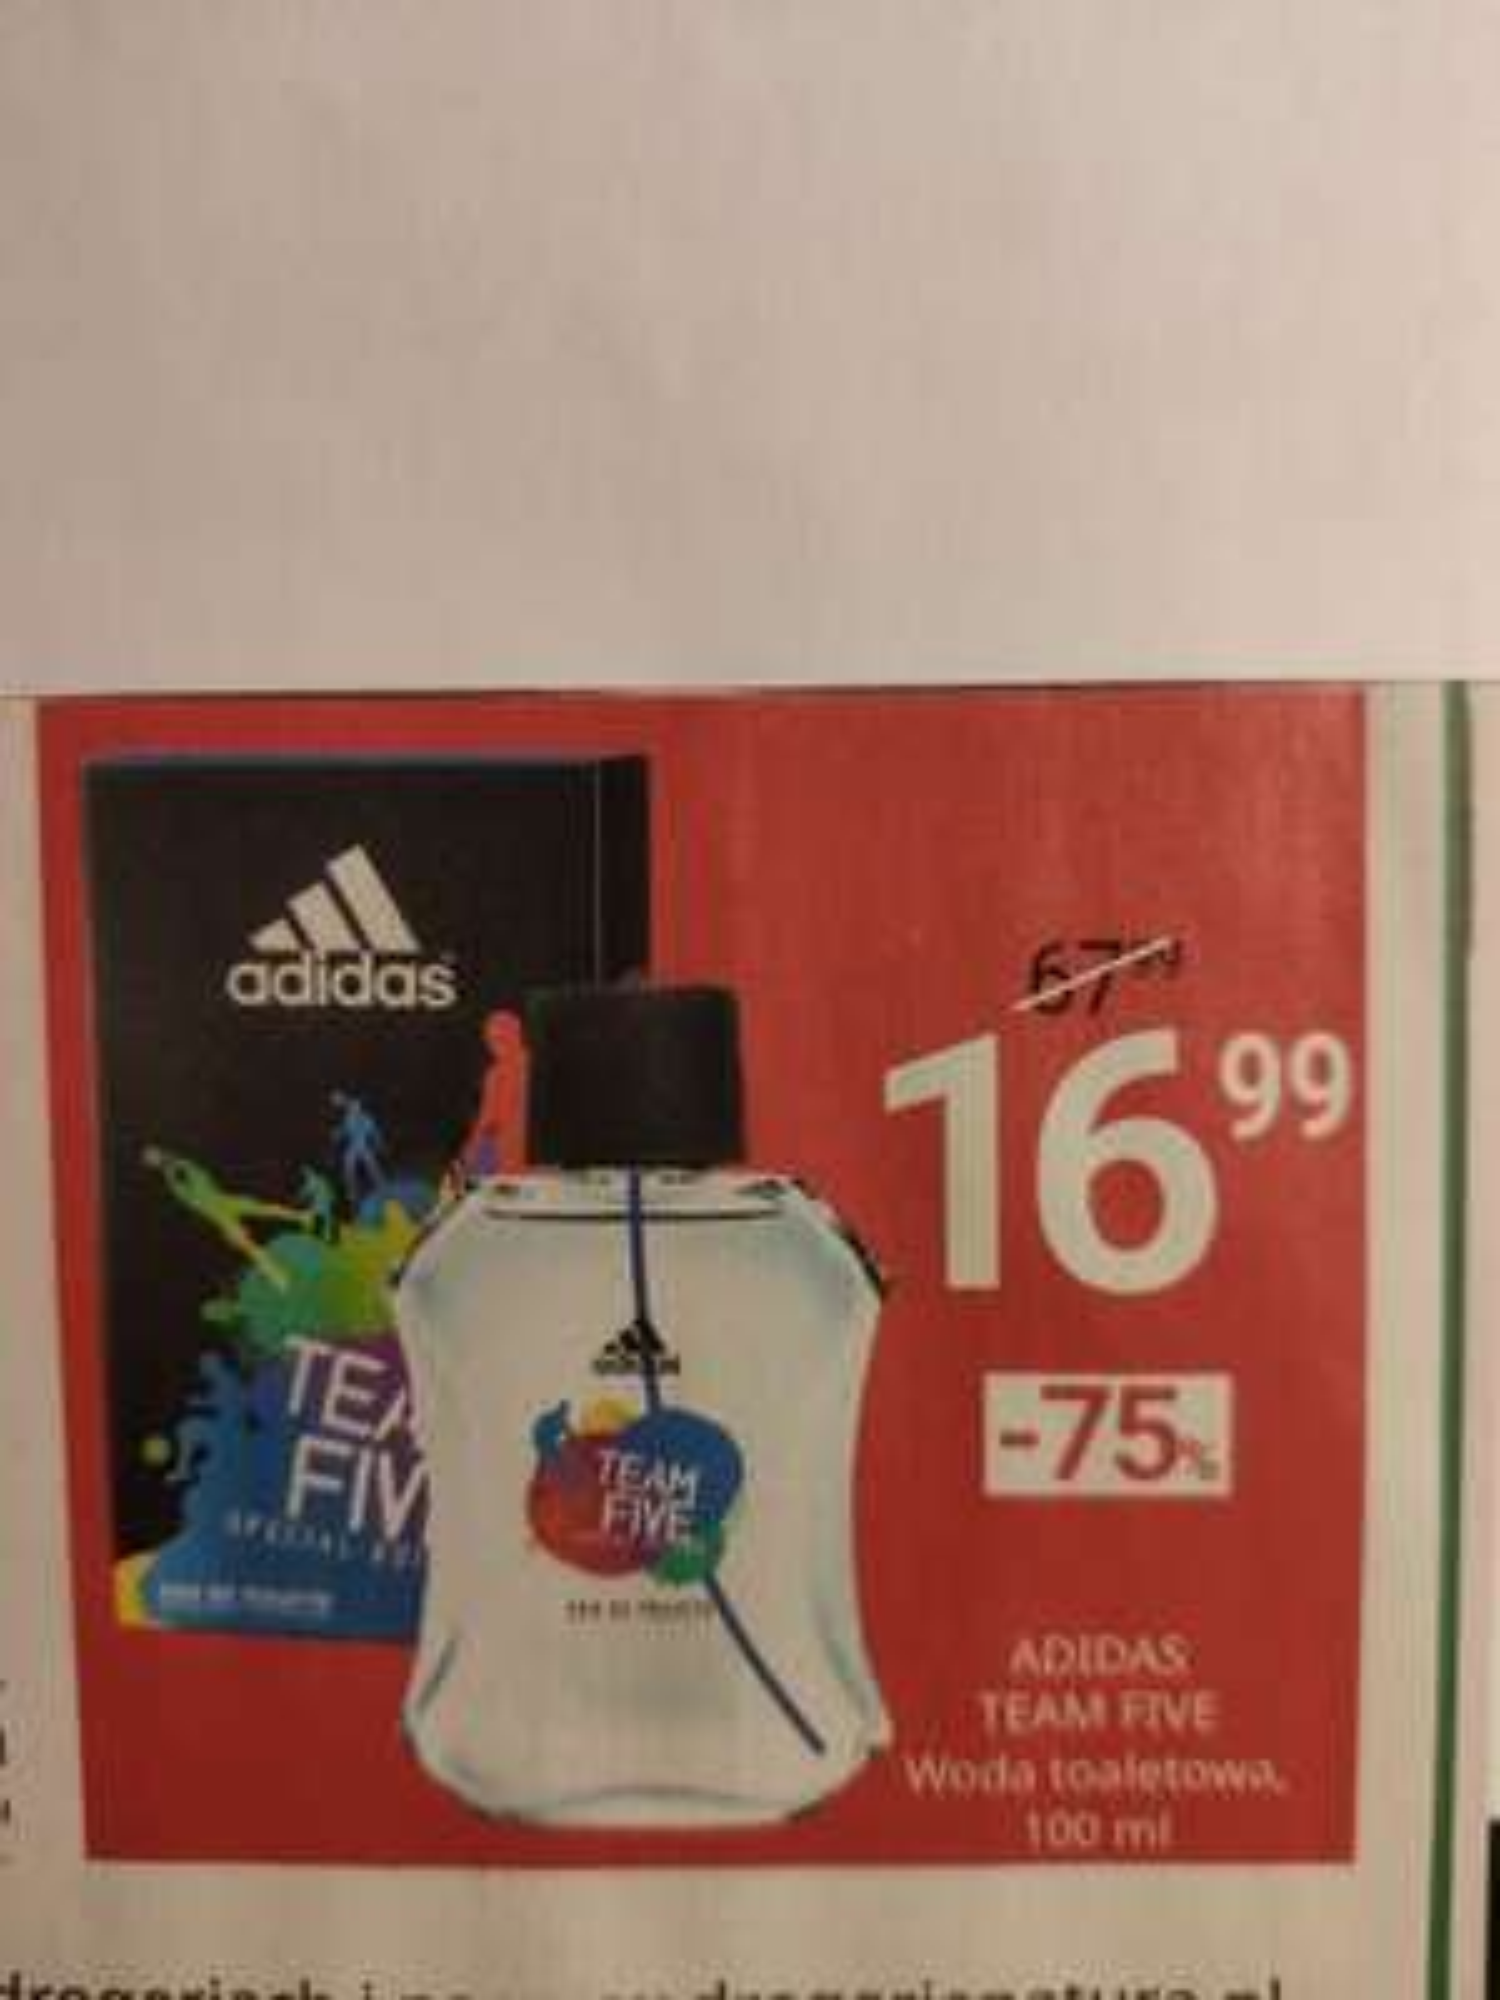 Adidas Team Five woda toaletowa 100 ml Drogeria Natura